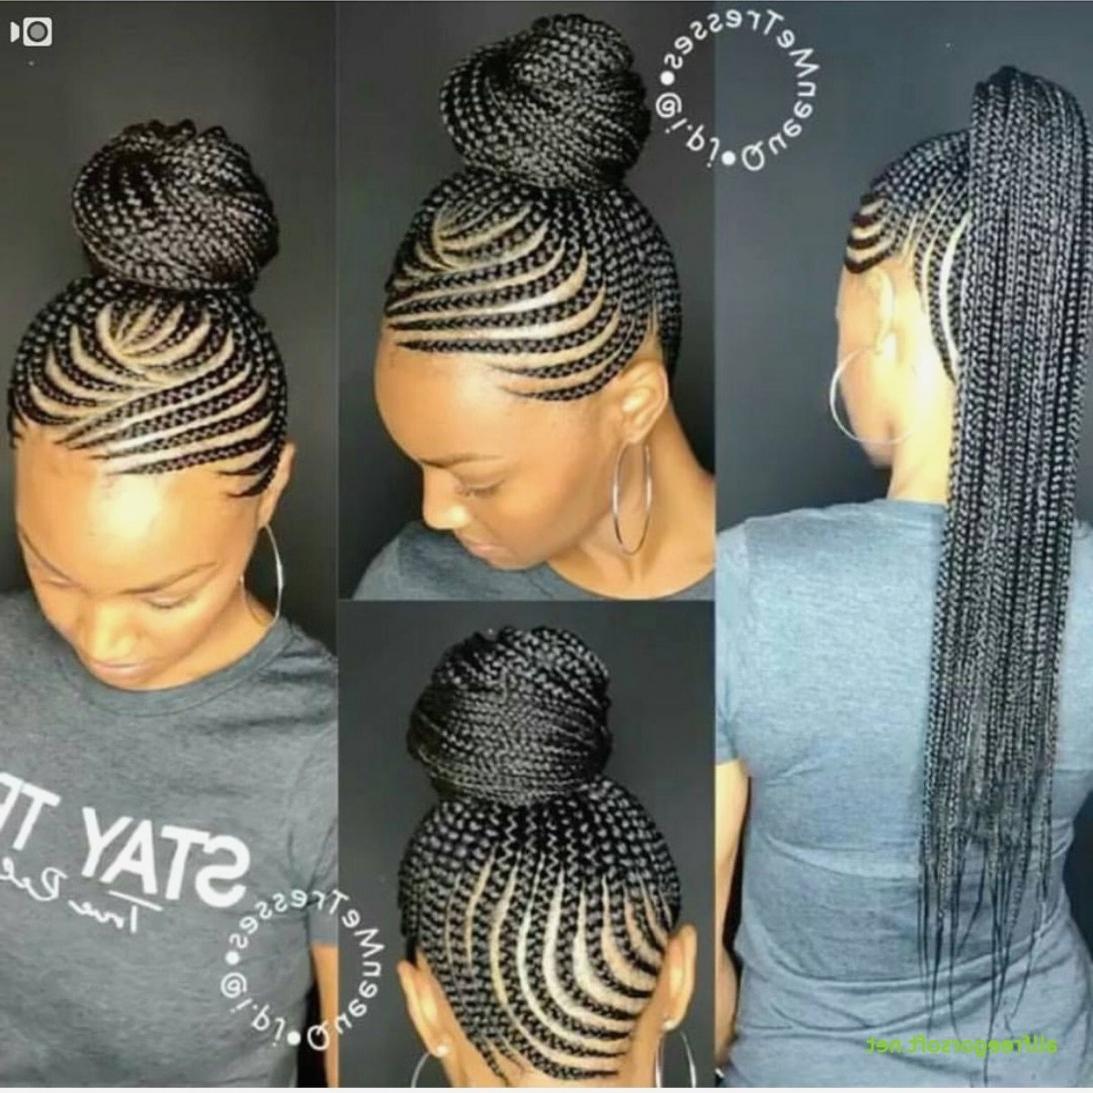 Black Girl Braided Hairstyles Inspirational Braid Hairstyles Black With Regard To Newest Braided Hairstyles For Black Girls (View 13 of 15)